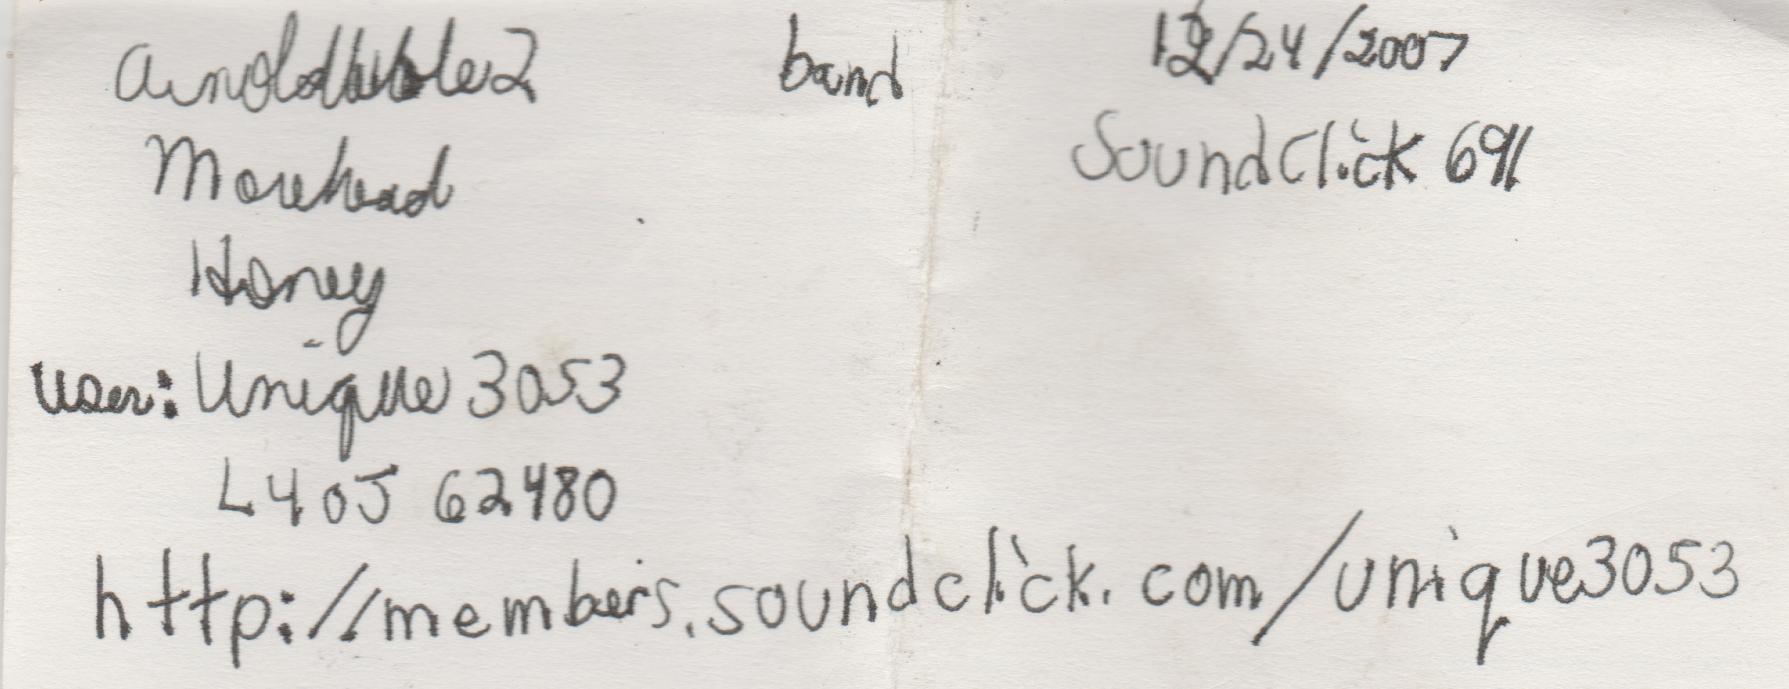 2007-12-24 - SoundClick.com, Unique3053, L4OJ 62480, arnoldbible2, morehead, honey.jpg